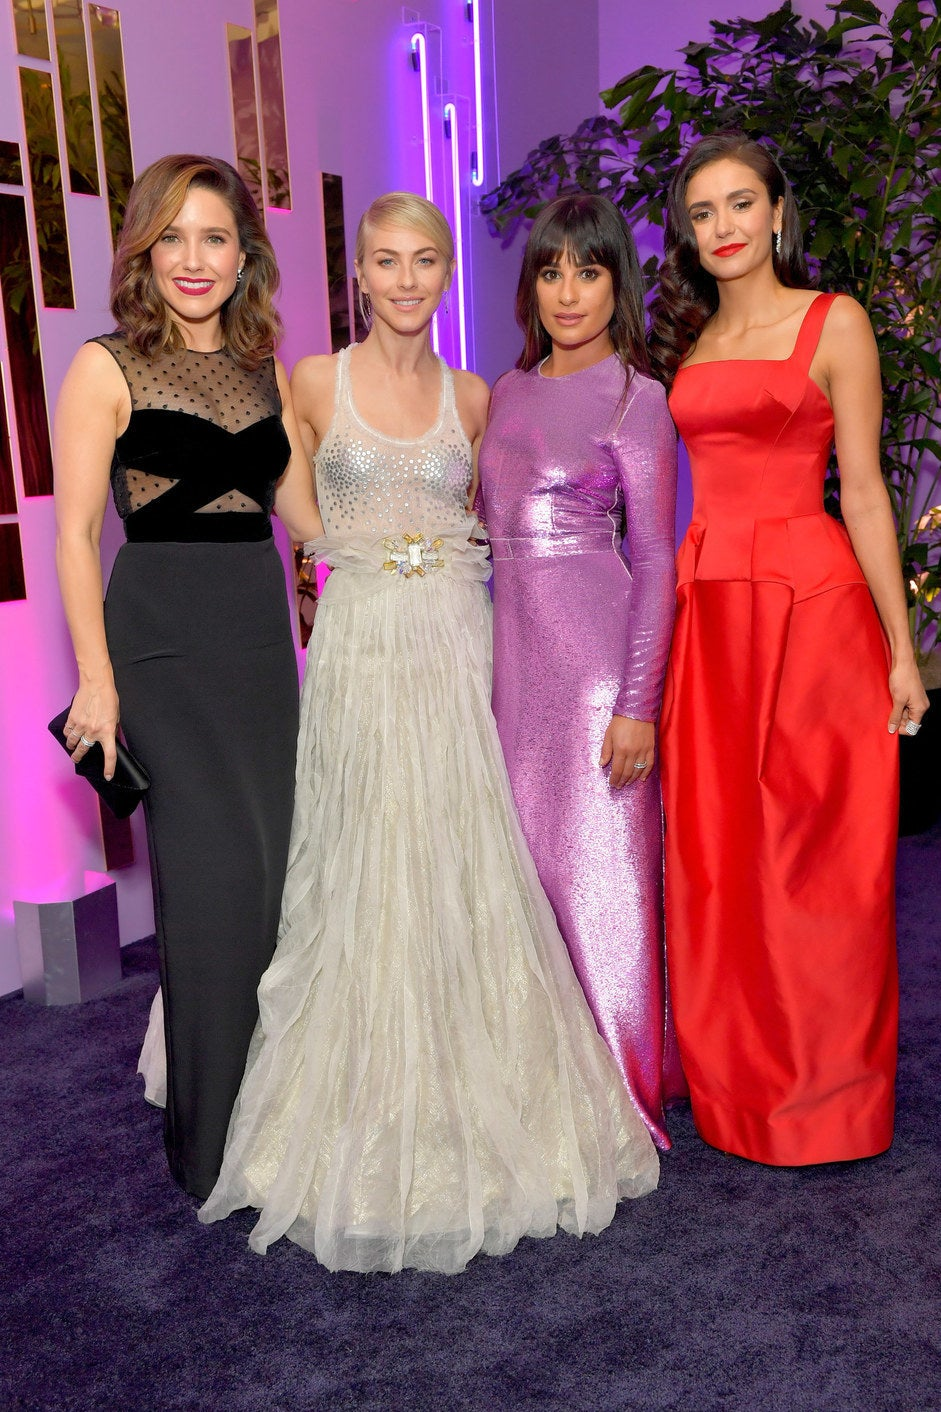 Sophia Bush, Julianne Hough, Lea Michele, and Nina Dobrev